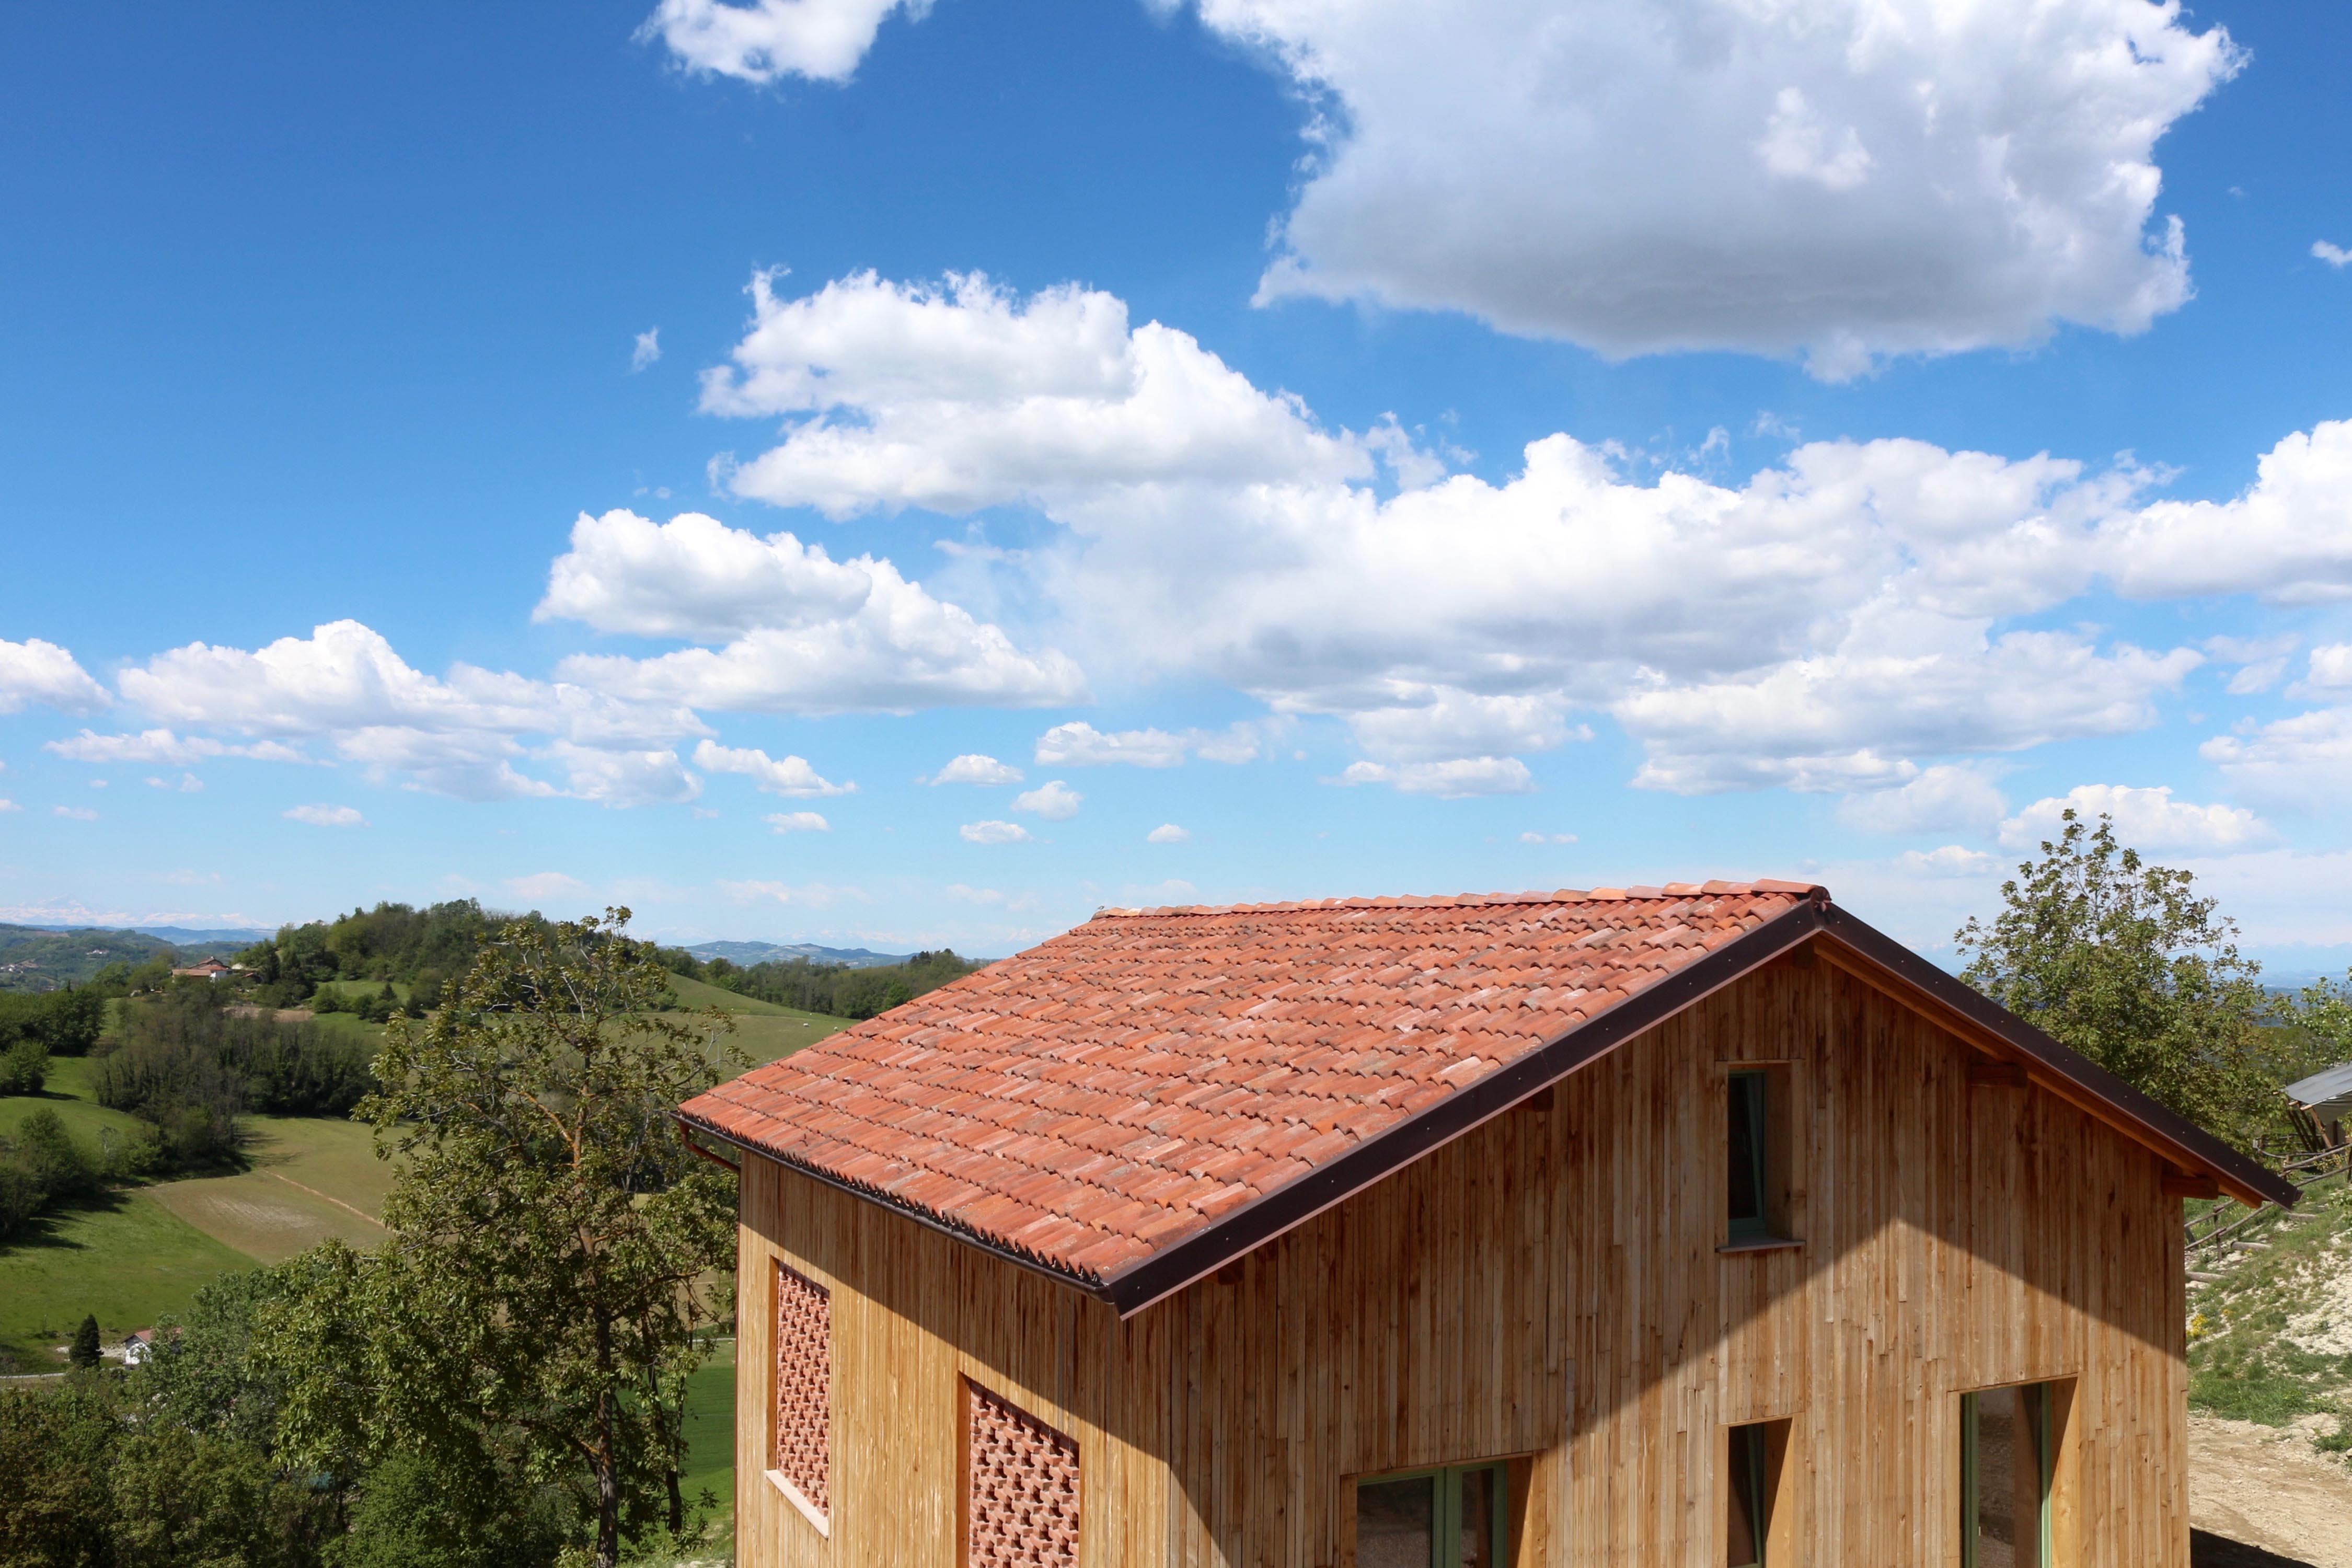 Architecture - Cascina Montebi